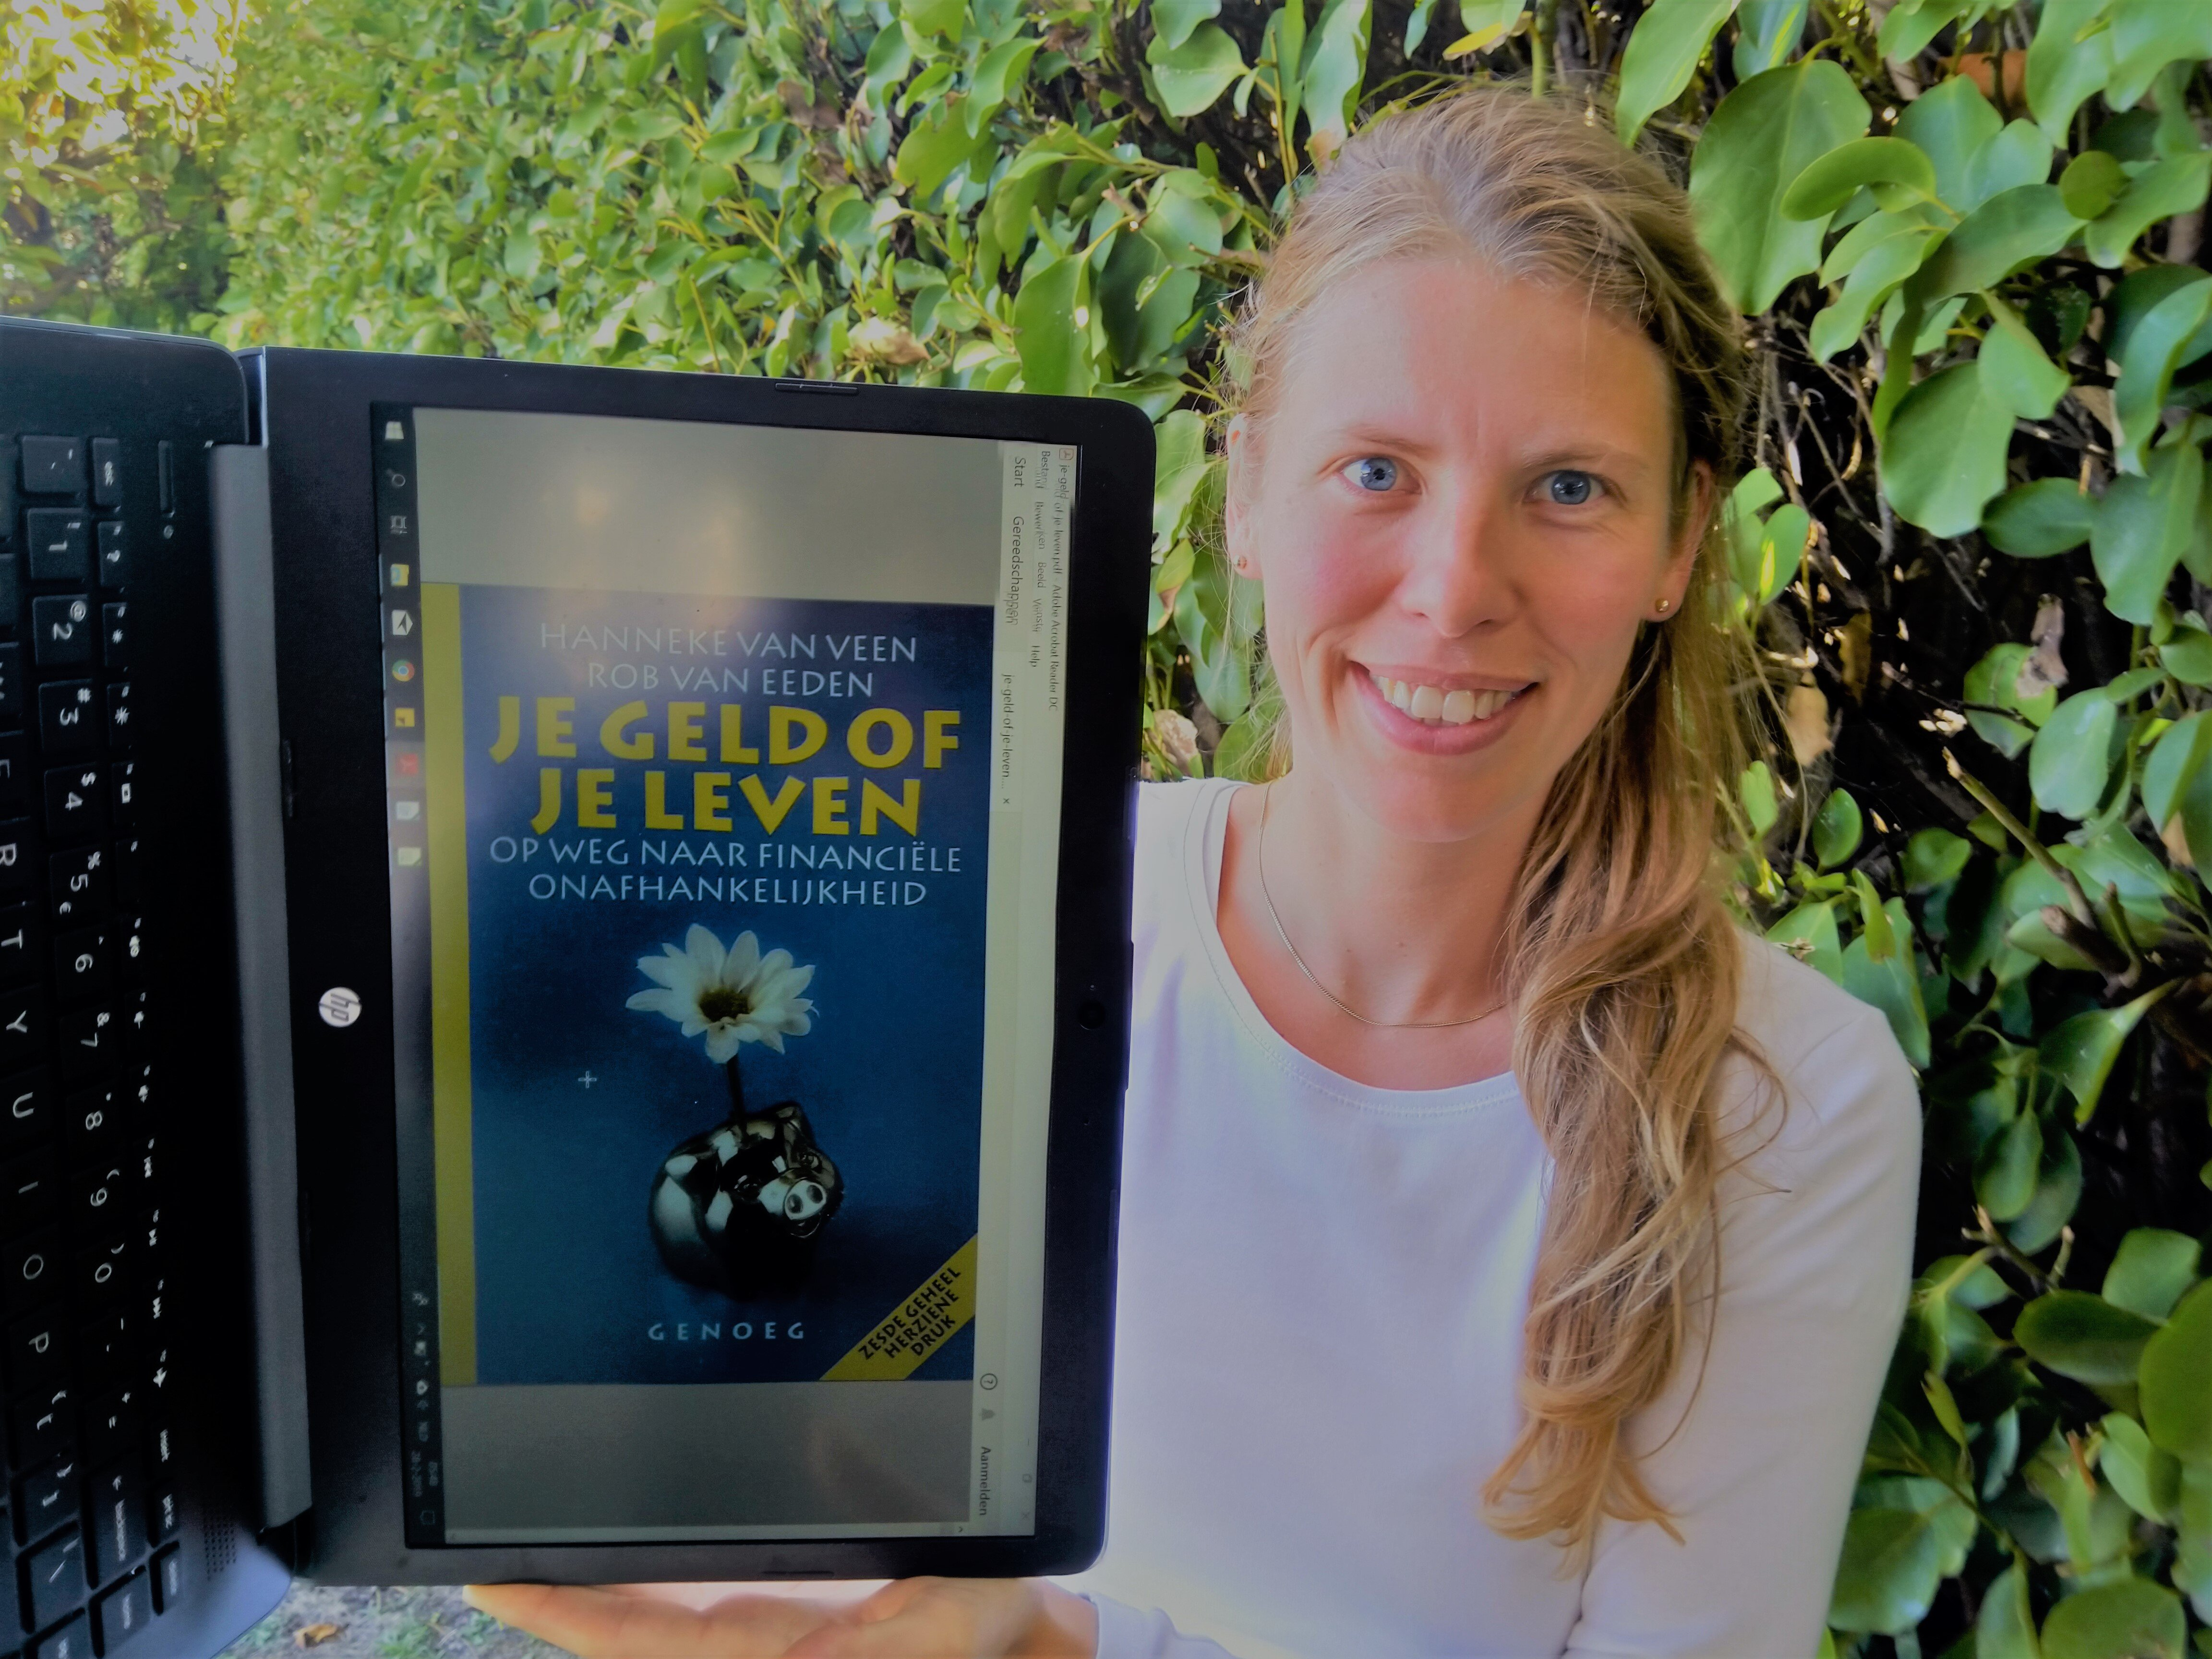 Boekreview: Je geld of je leven